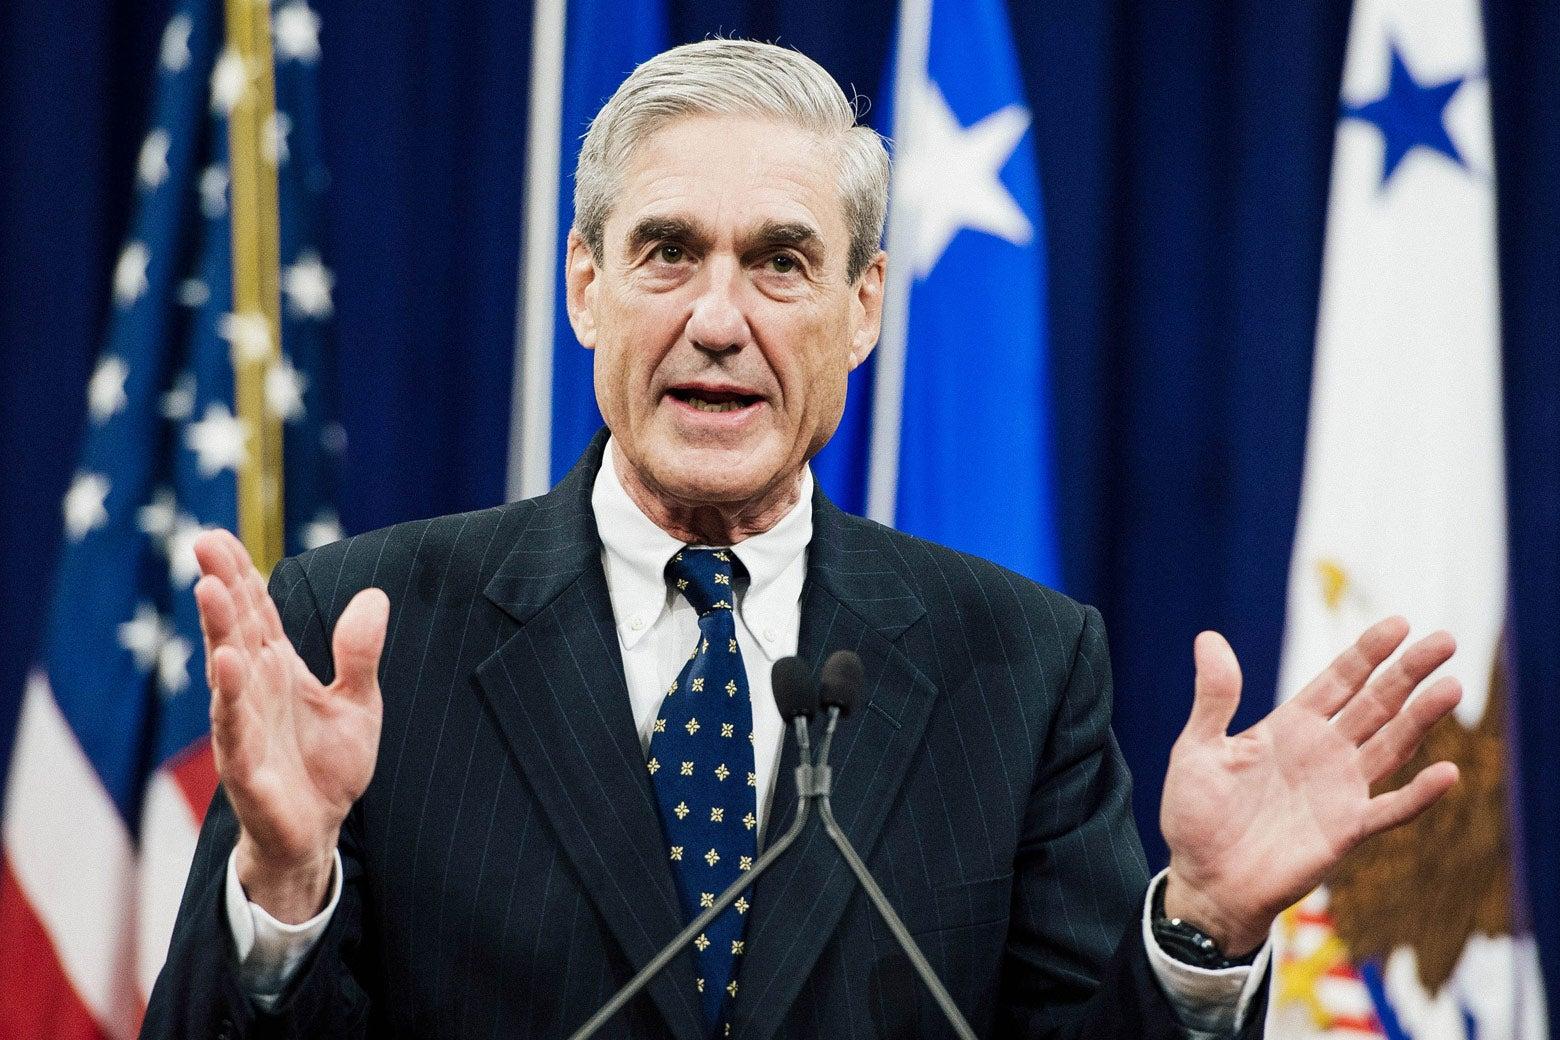 Robert Mueller, as seen in this 2013 photo during his tenure as FBI director.